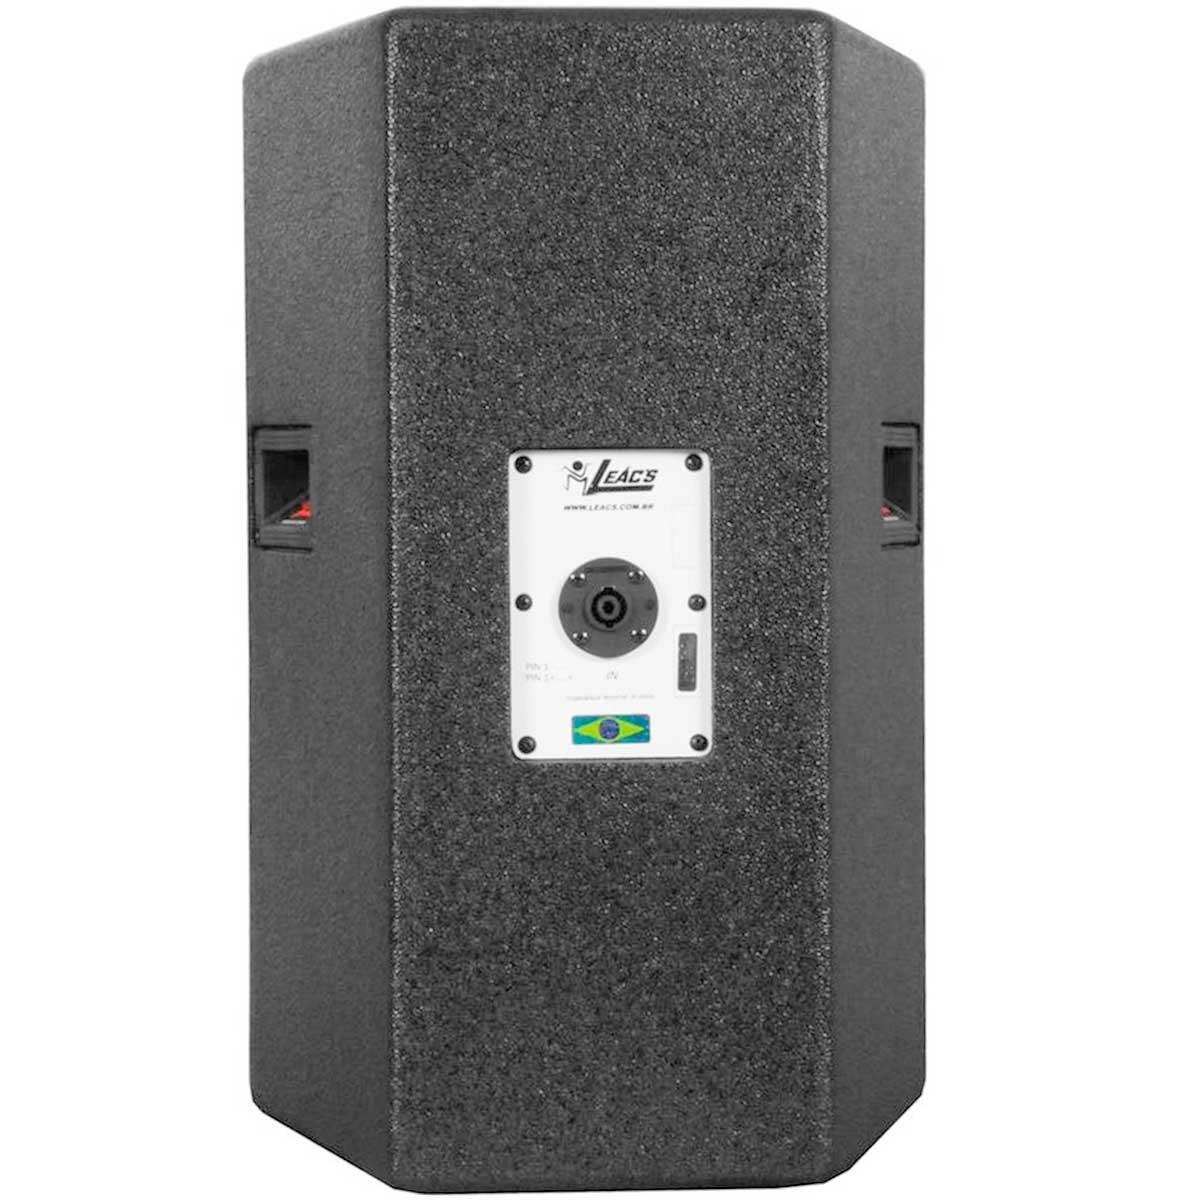 Caixa Passiva Fal 12 Pol 200W - Pulps 550 Leacs